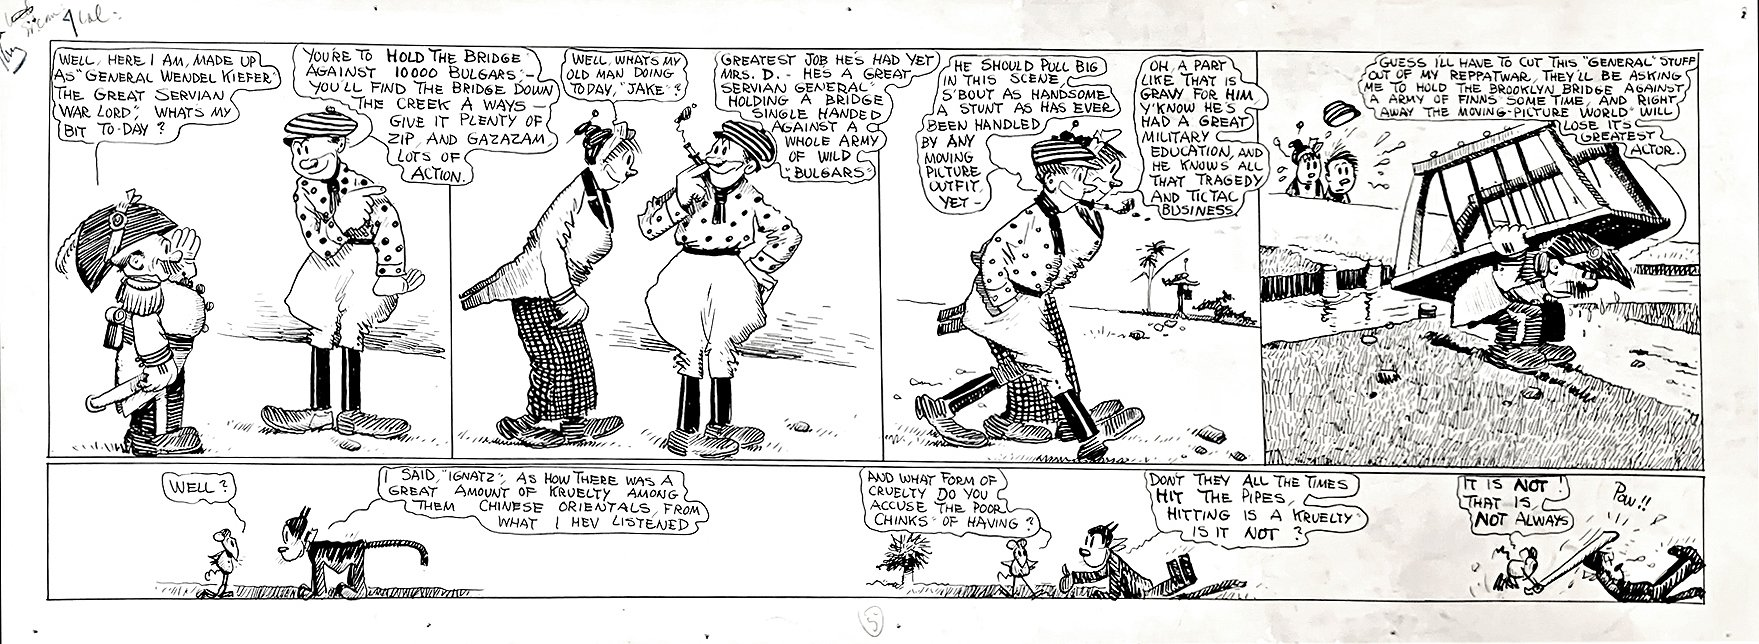 PRE-Krazy Kat...Crazy Kat Strip! Large - 1912